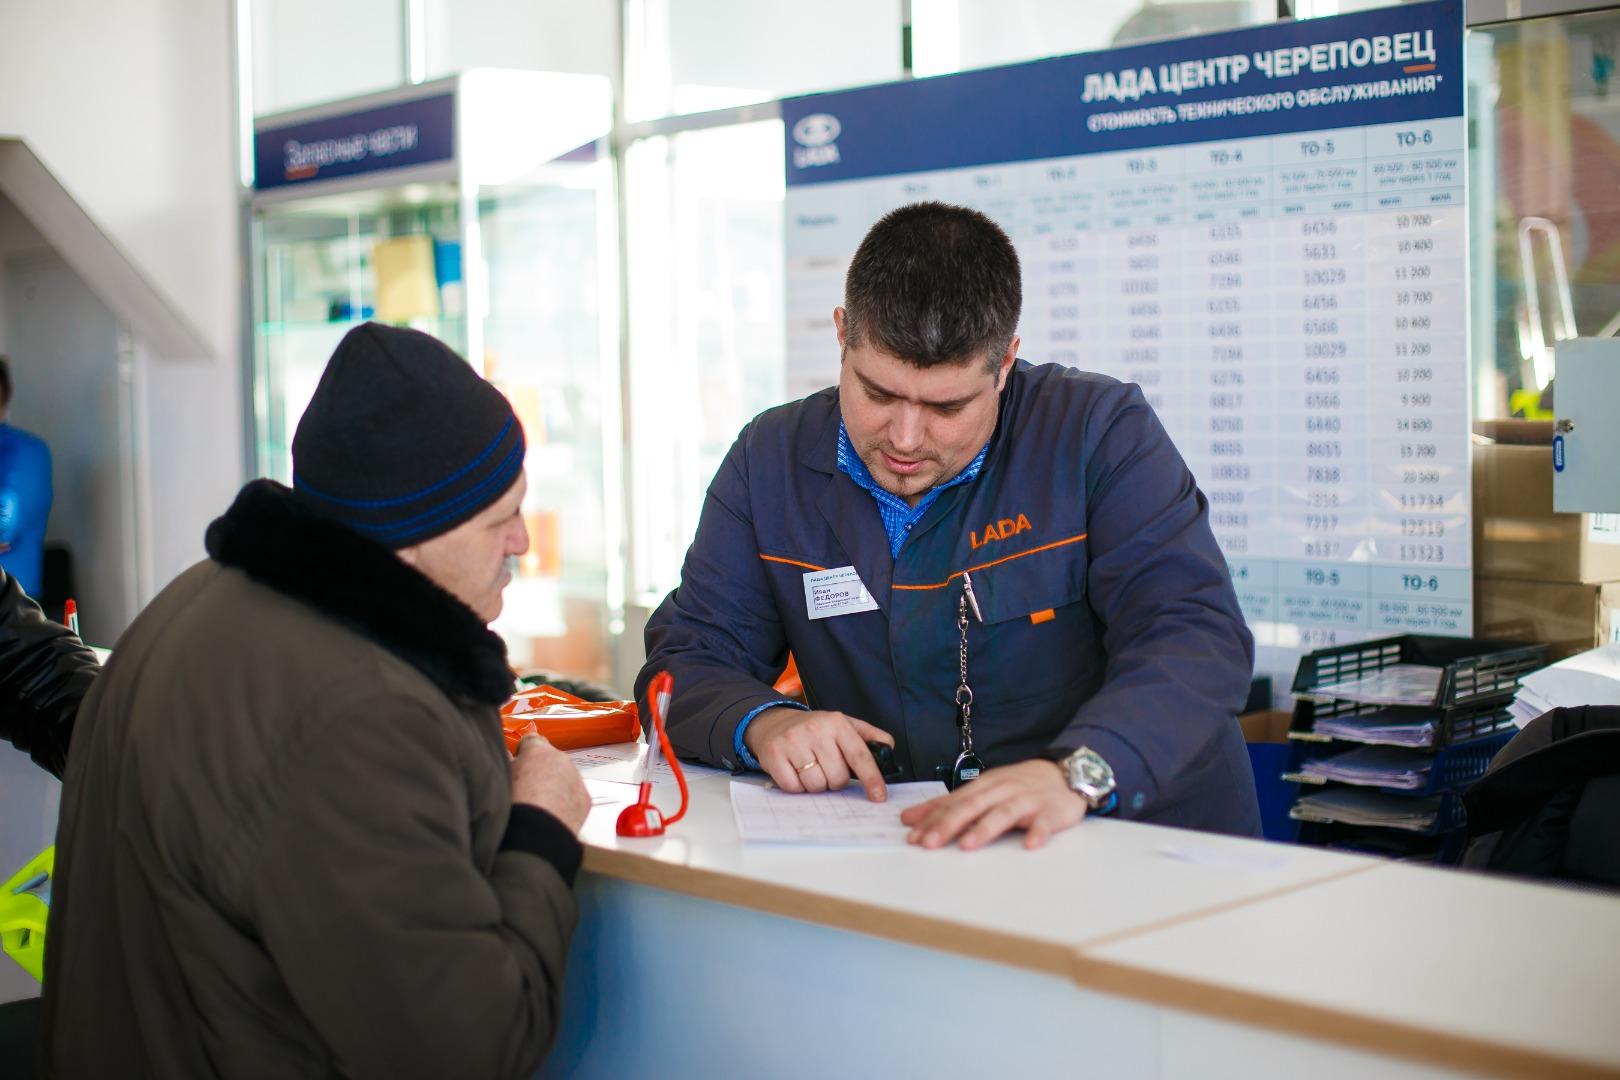 LADA DAY SERVICE в ЛАДА центр Череповец 16 февраля 2019 года